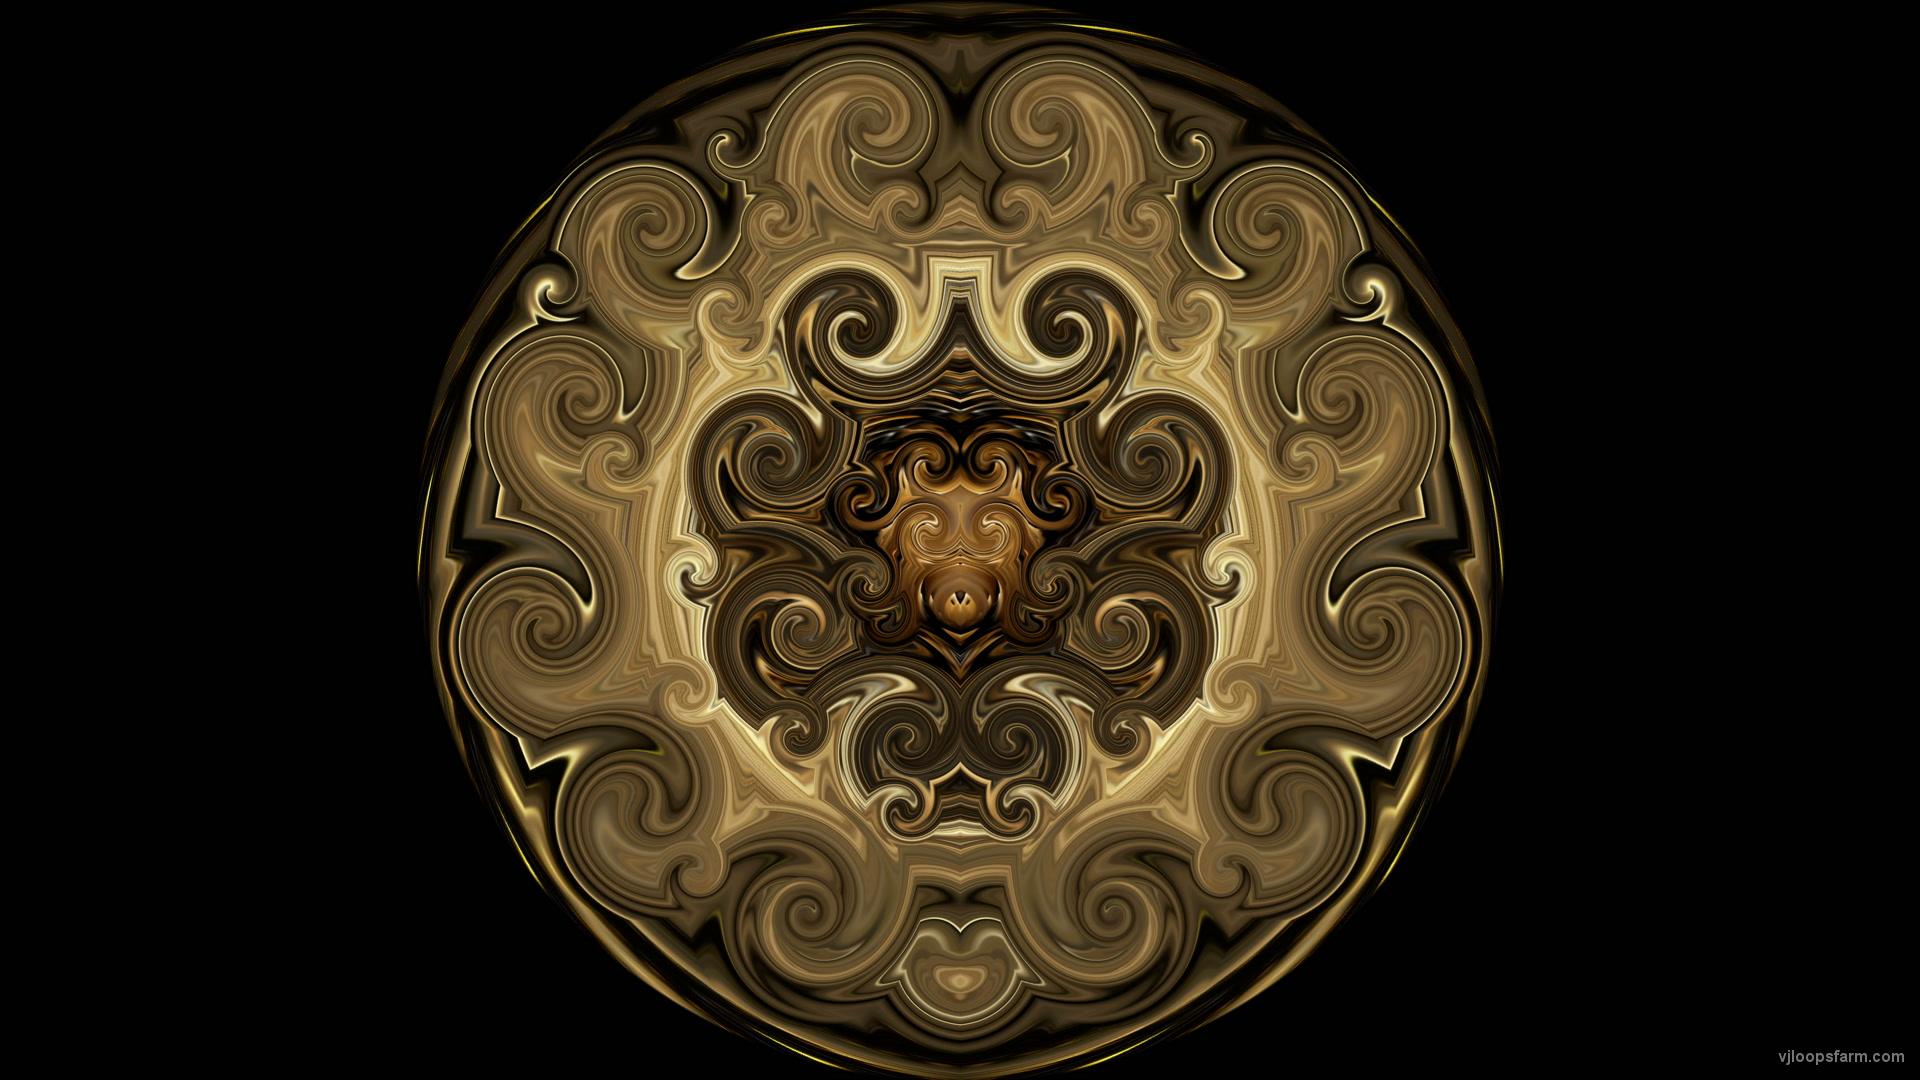 vj video background Twirl-Golden-Sun-Fulldome-Projection-Vj-Loop-Art-Visuals_003